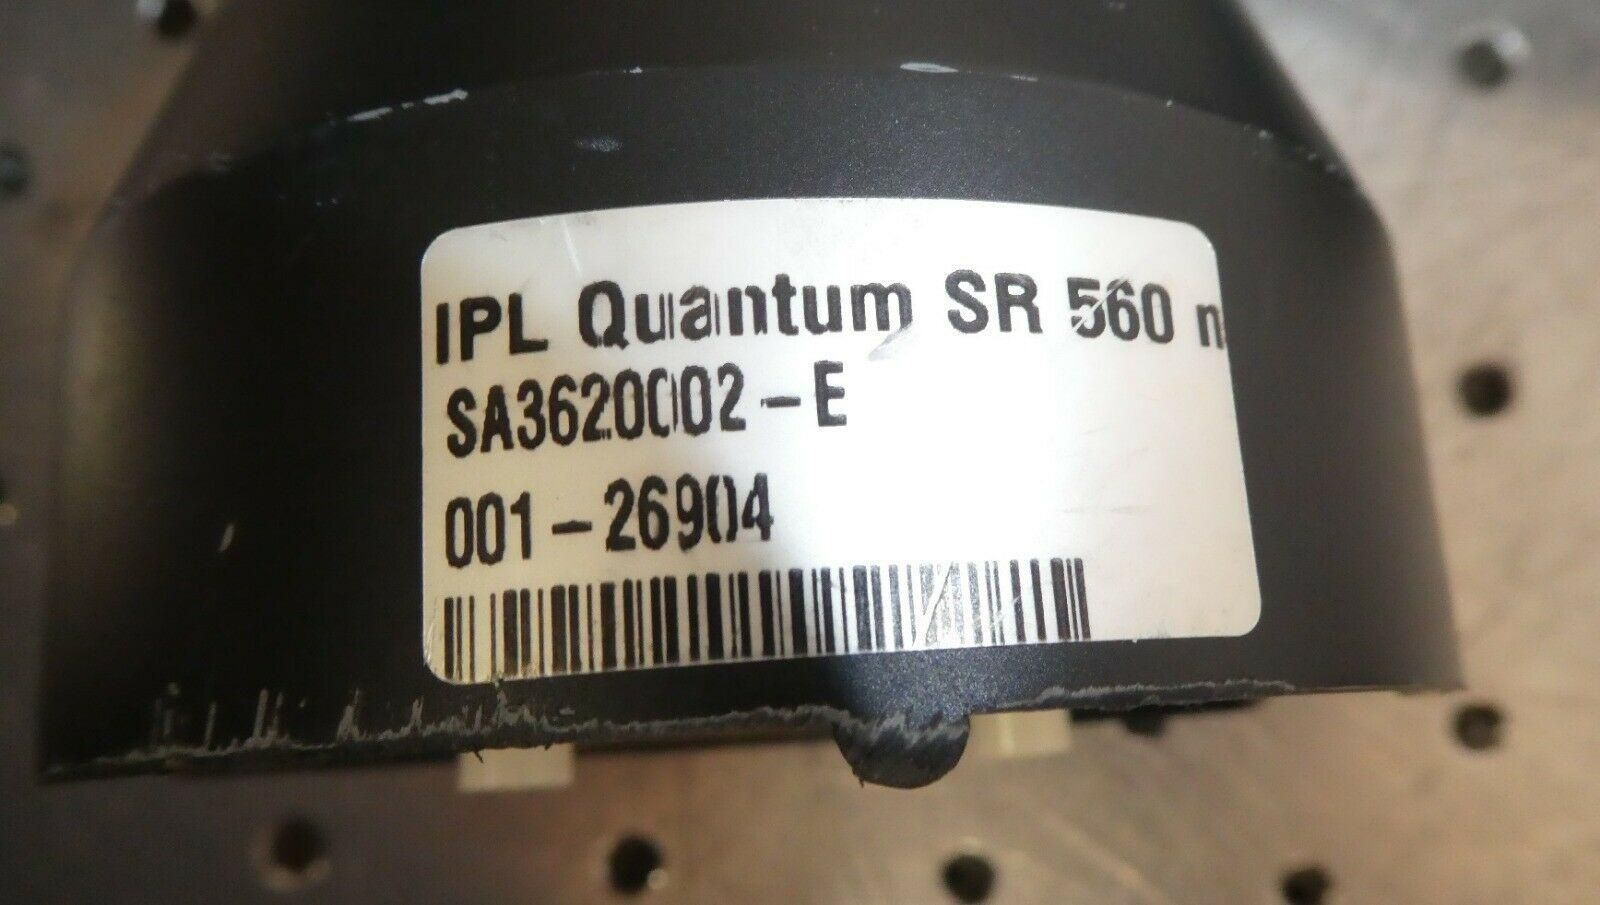 R159330 Lumenis IPL Quantum SR 560 N Laser Treatment Head SA362002-H SR560